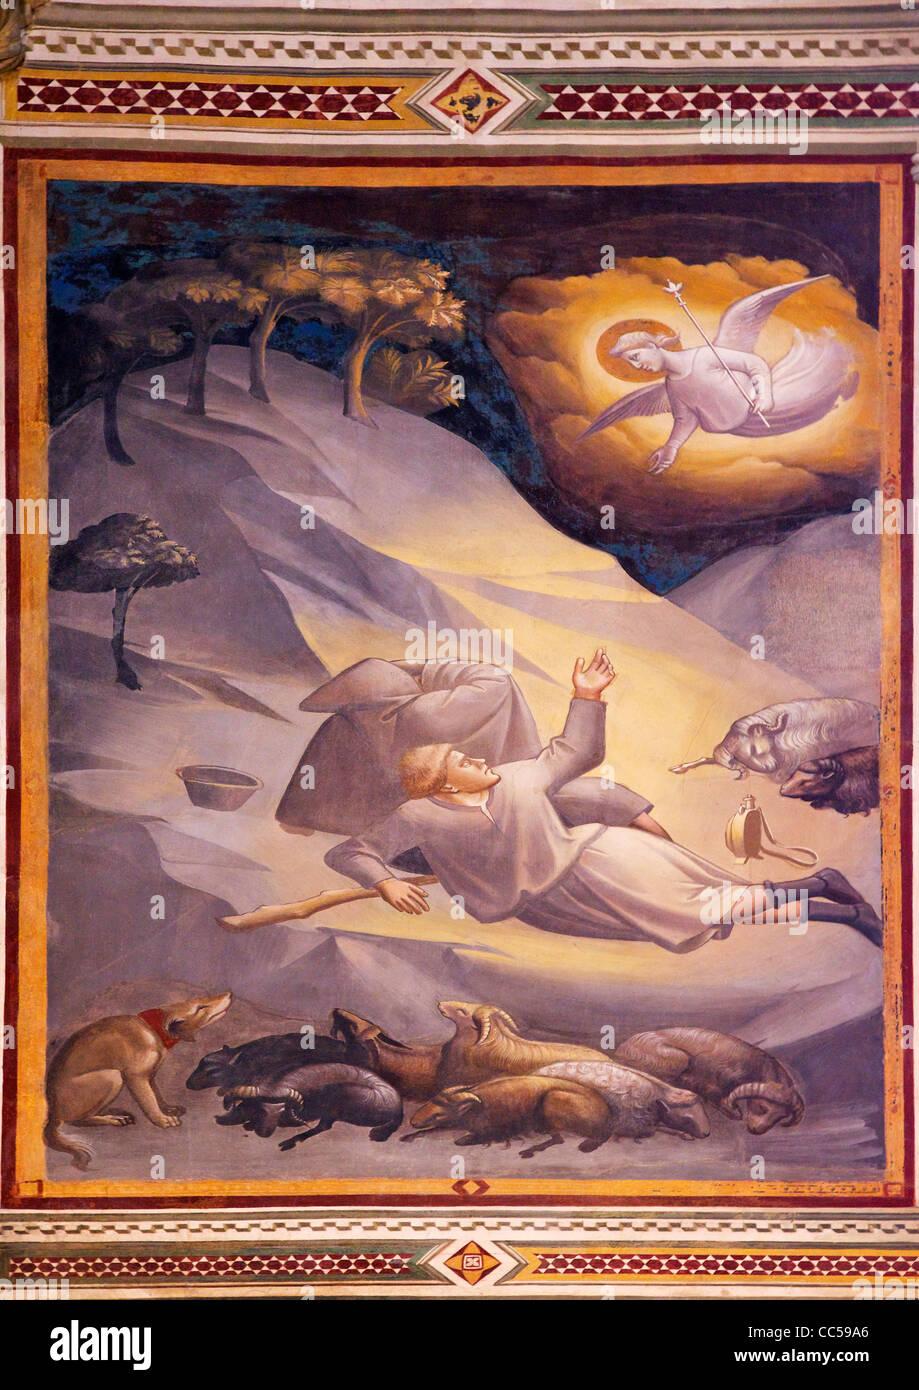 Fresco of angels summoning the shepherds near Bethlehem, by Taddeo Gaddi, Baroncelli Chapel, Basilica of Santa Croce, - Stock Image